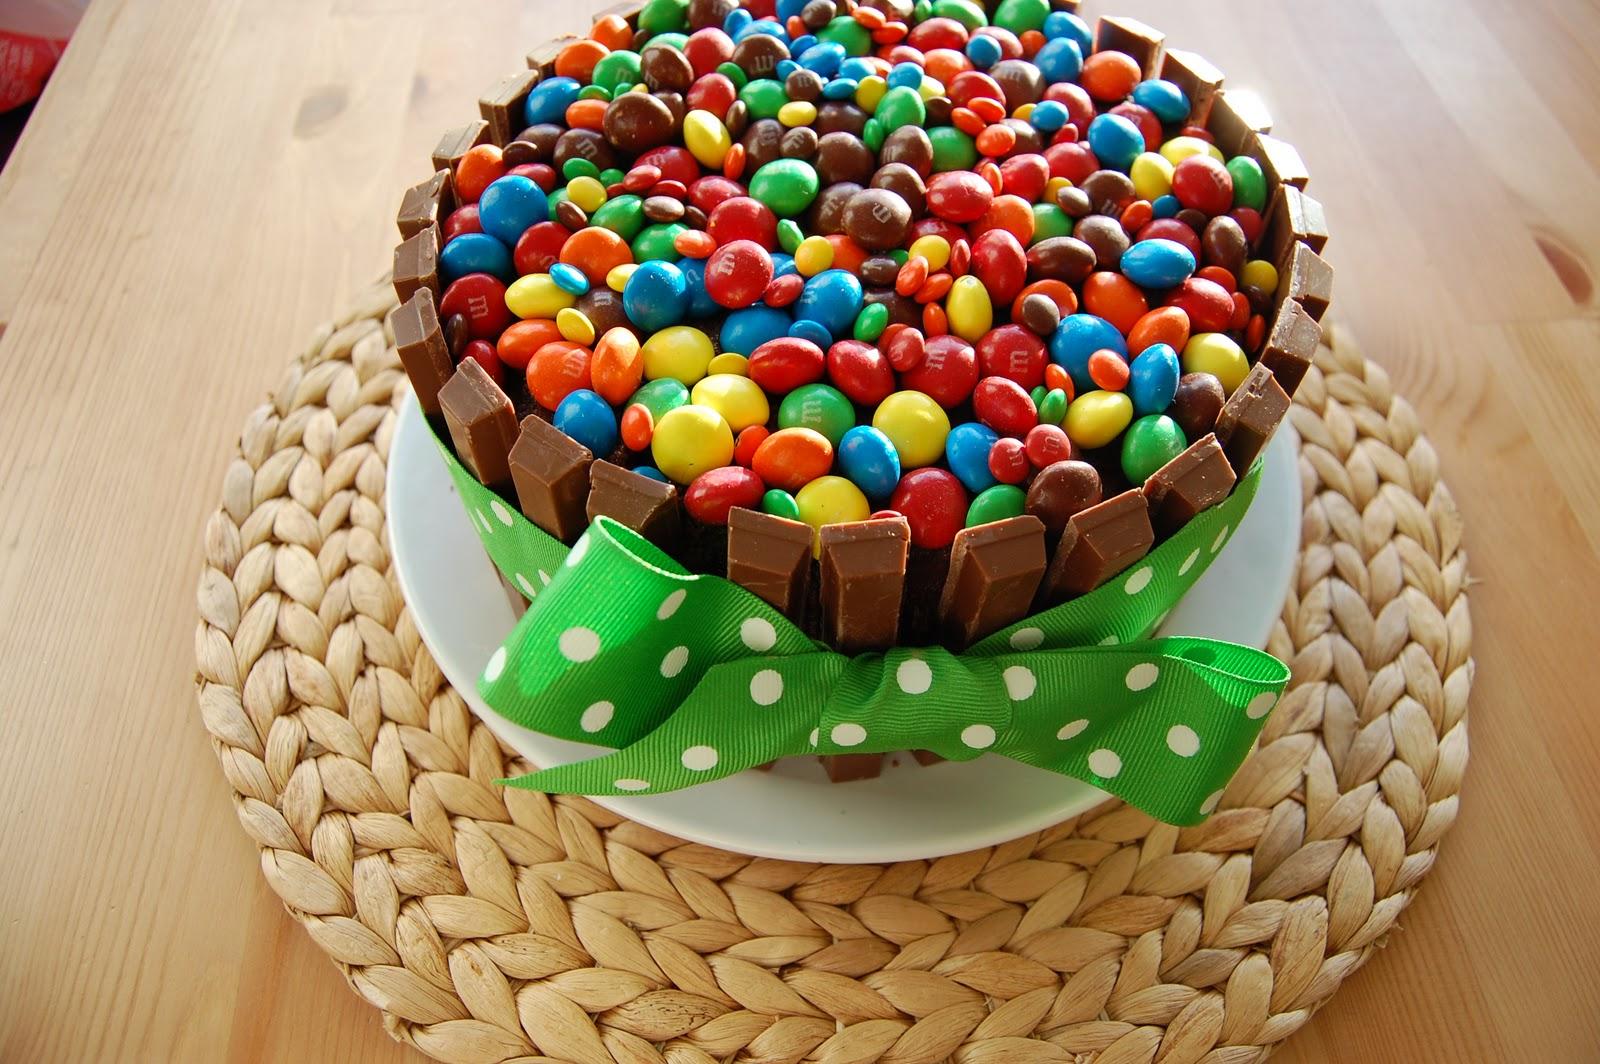 Vegetarian Faerie In The Kitchen Kit Kat Colourful Birthday Cake